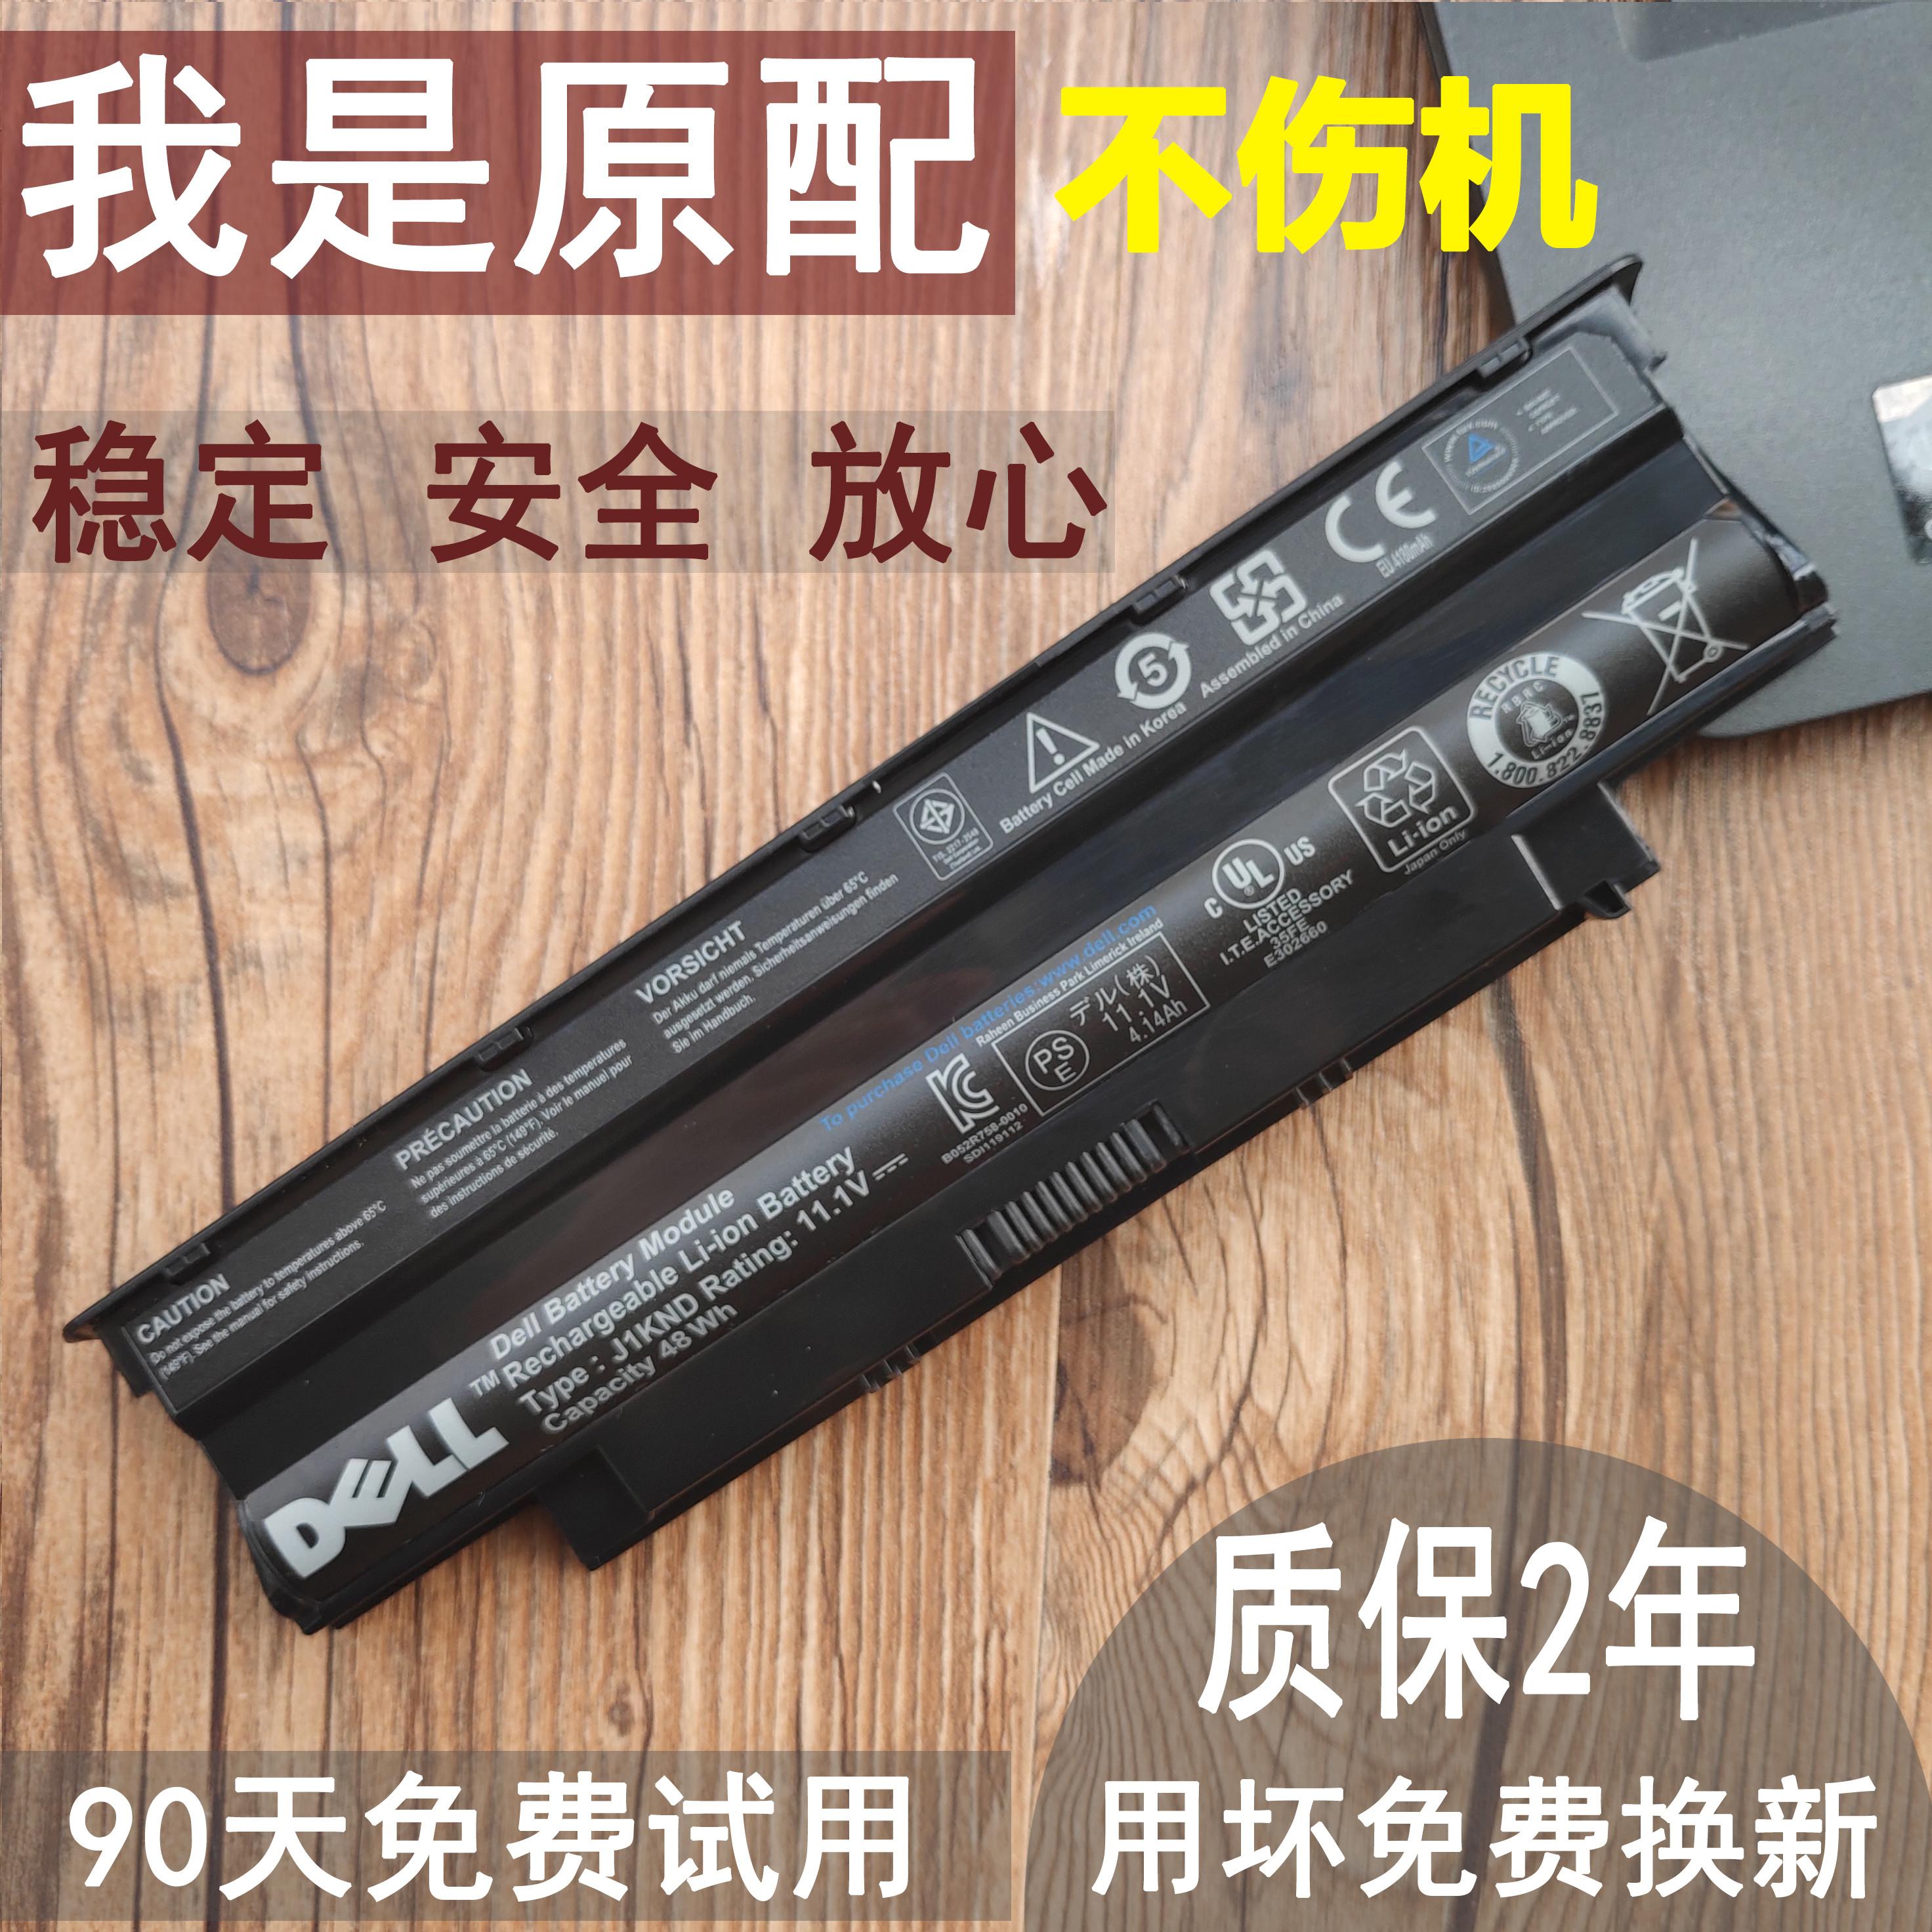 原装戴尔N4010 N5010 M5010 N4050 N5110 N4110J1KND笔记本电池